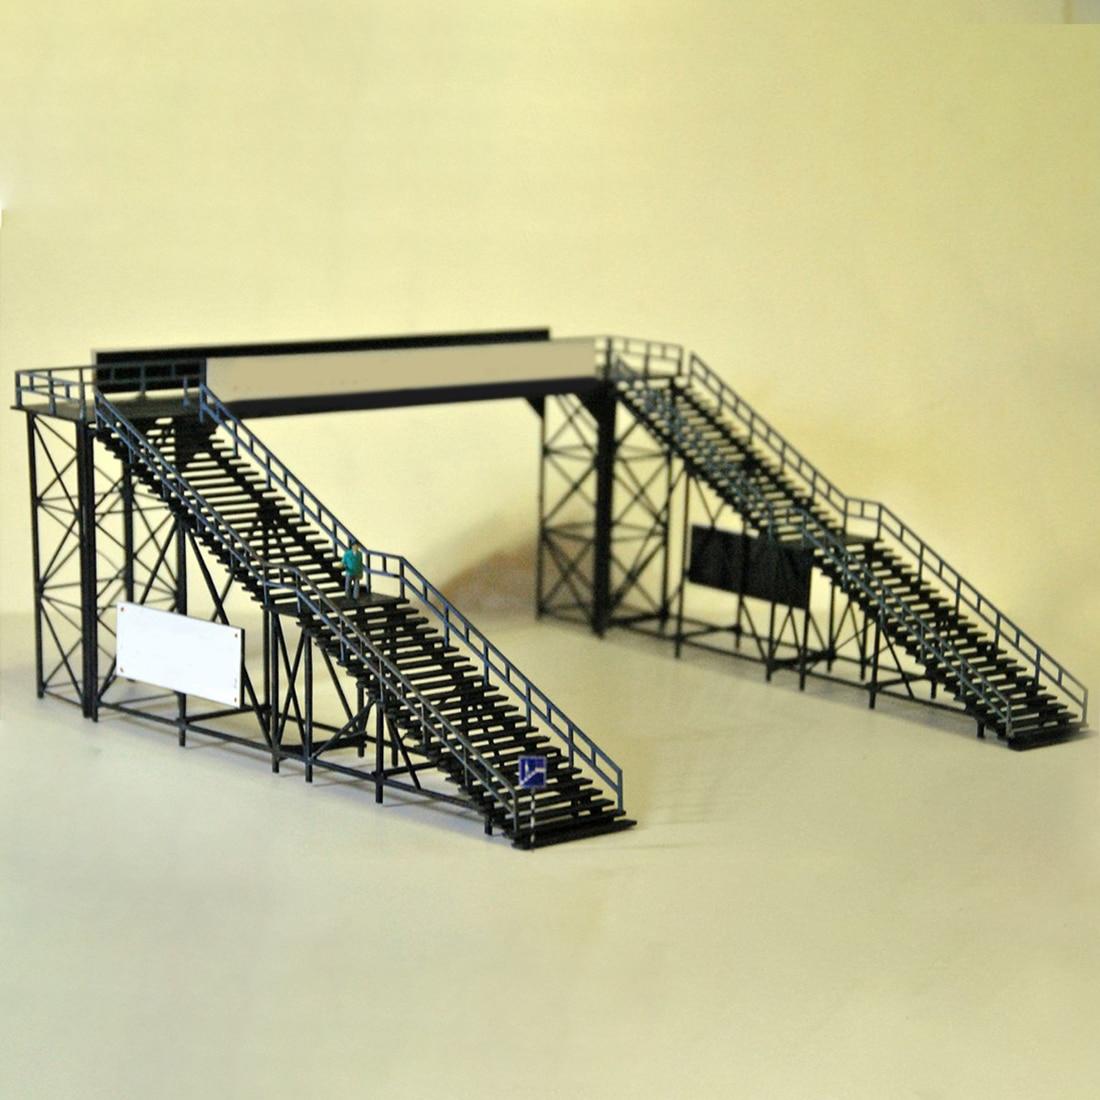 Surwish 1 Pcs 1:87 HO Scale Railway Station Footbridge Model Sand Table Scene Decoration Model Kit